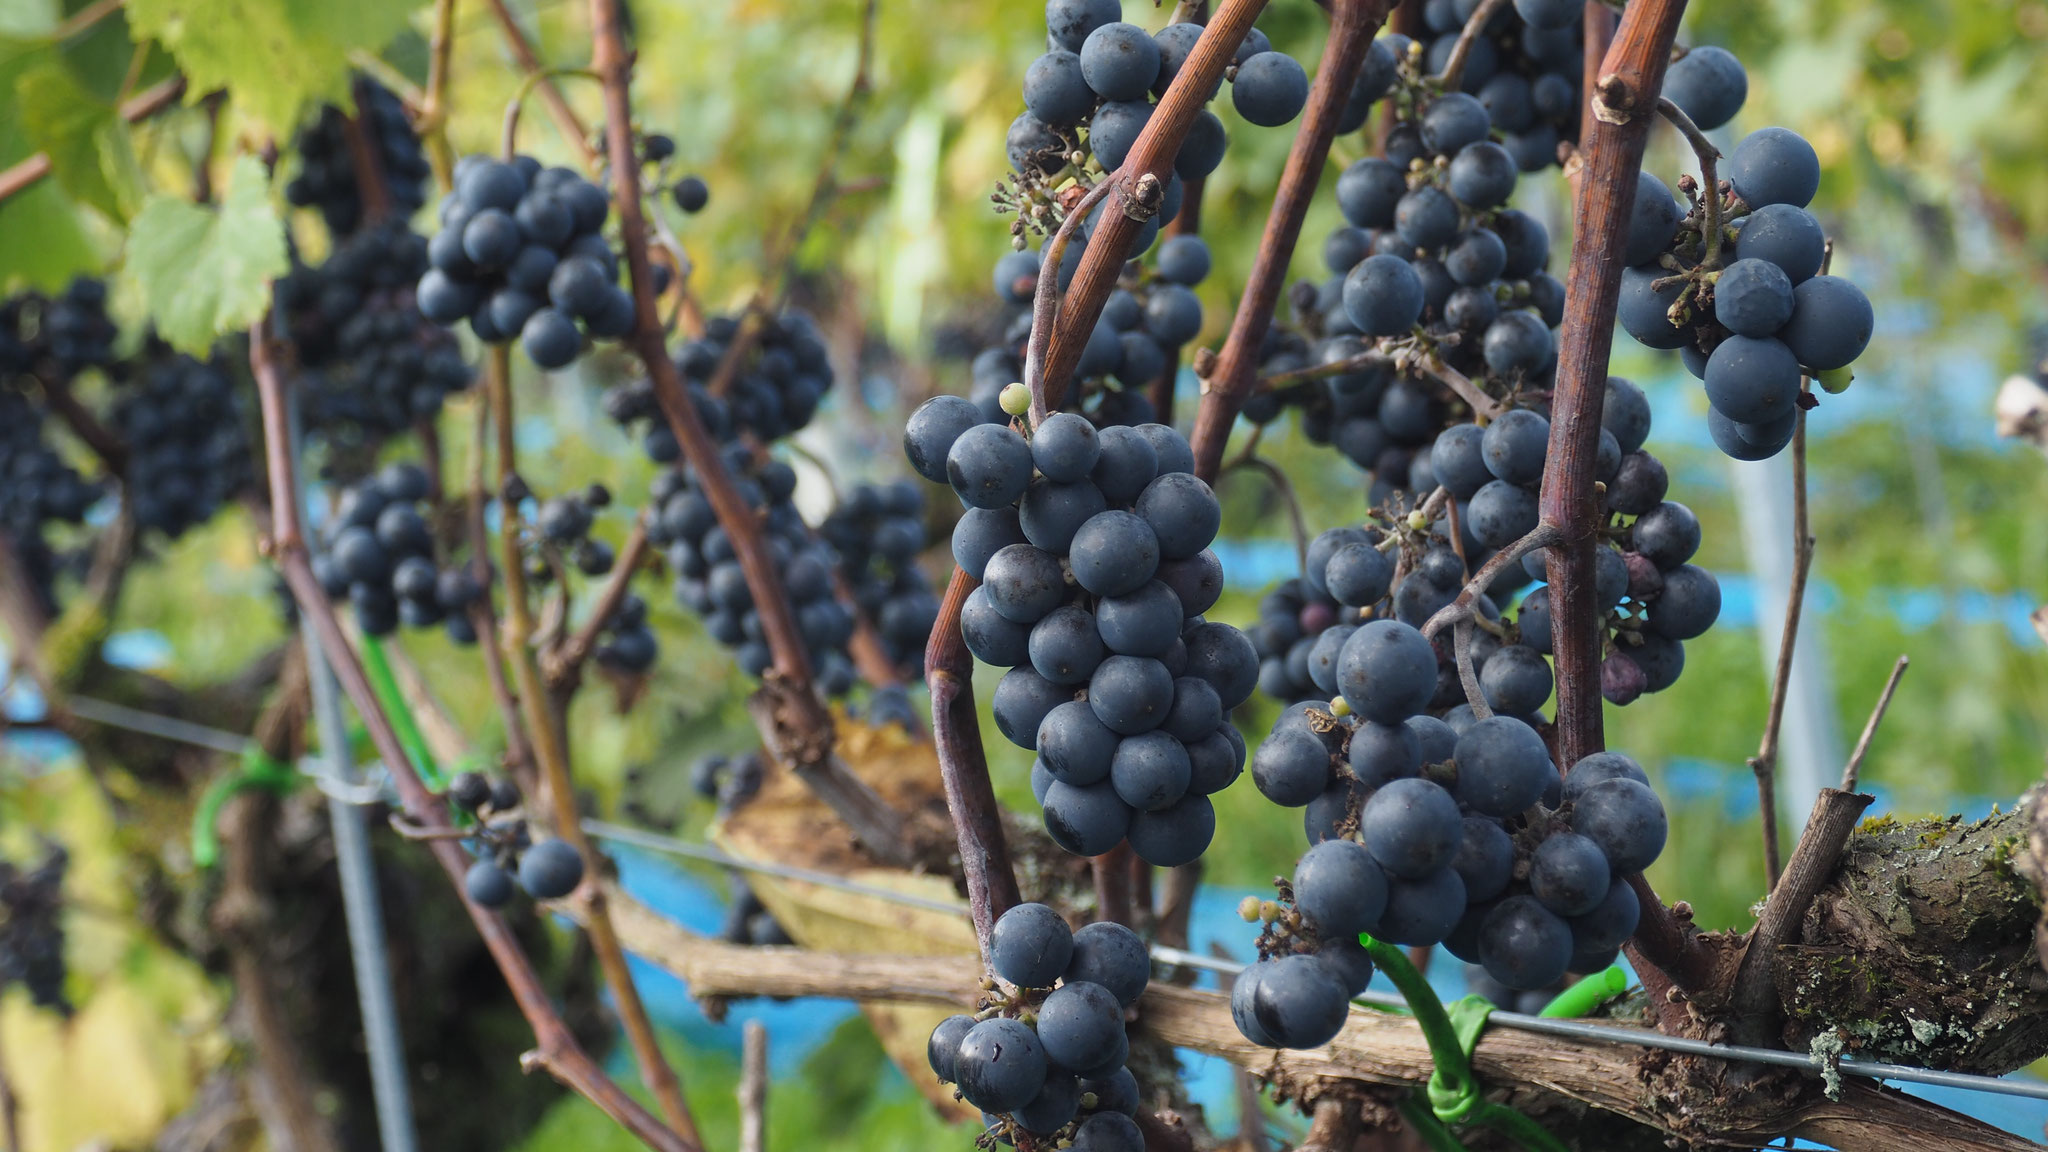 20 Zur Räbluus: Käsespätzli mit Apfelmus, Dälliker Wein und Grappa